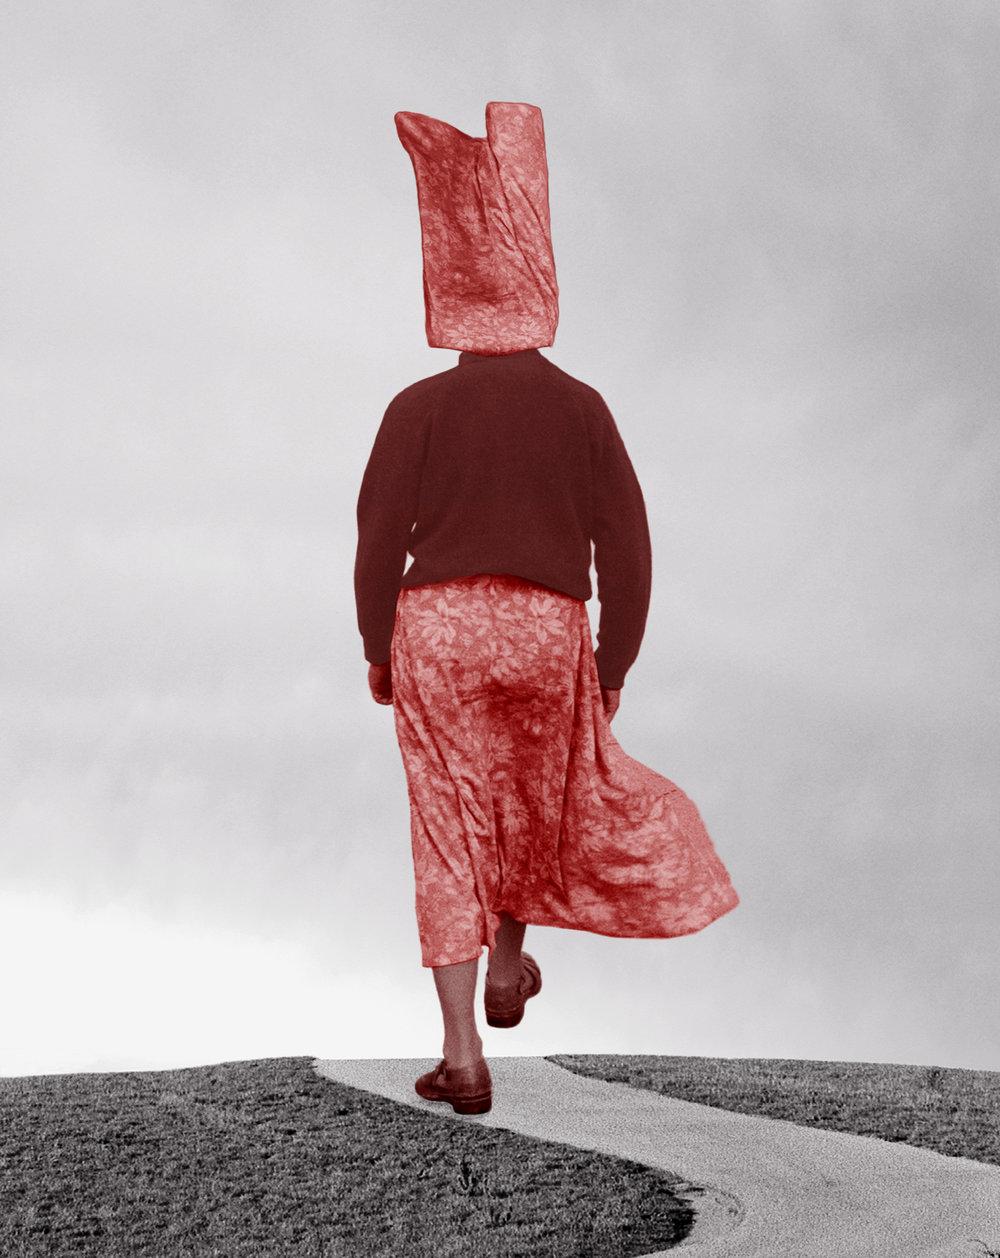 Pat Brassington, By the Way, 2010, Pigment Print, 72 x 90 cm